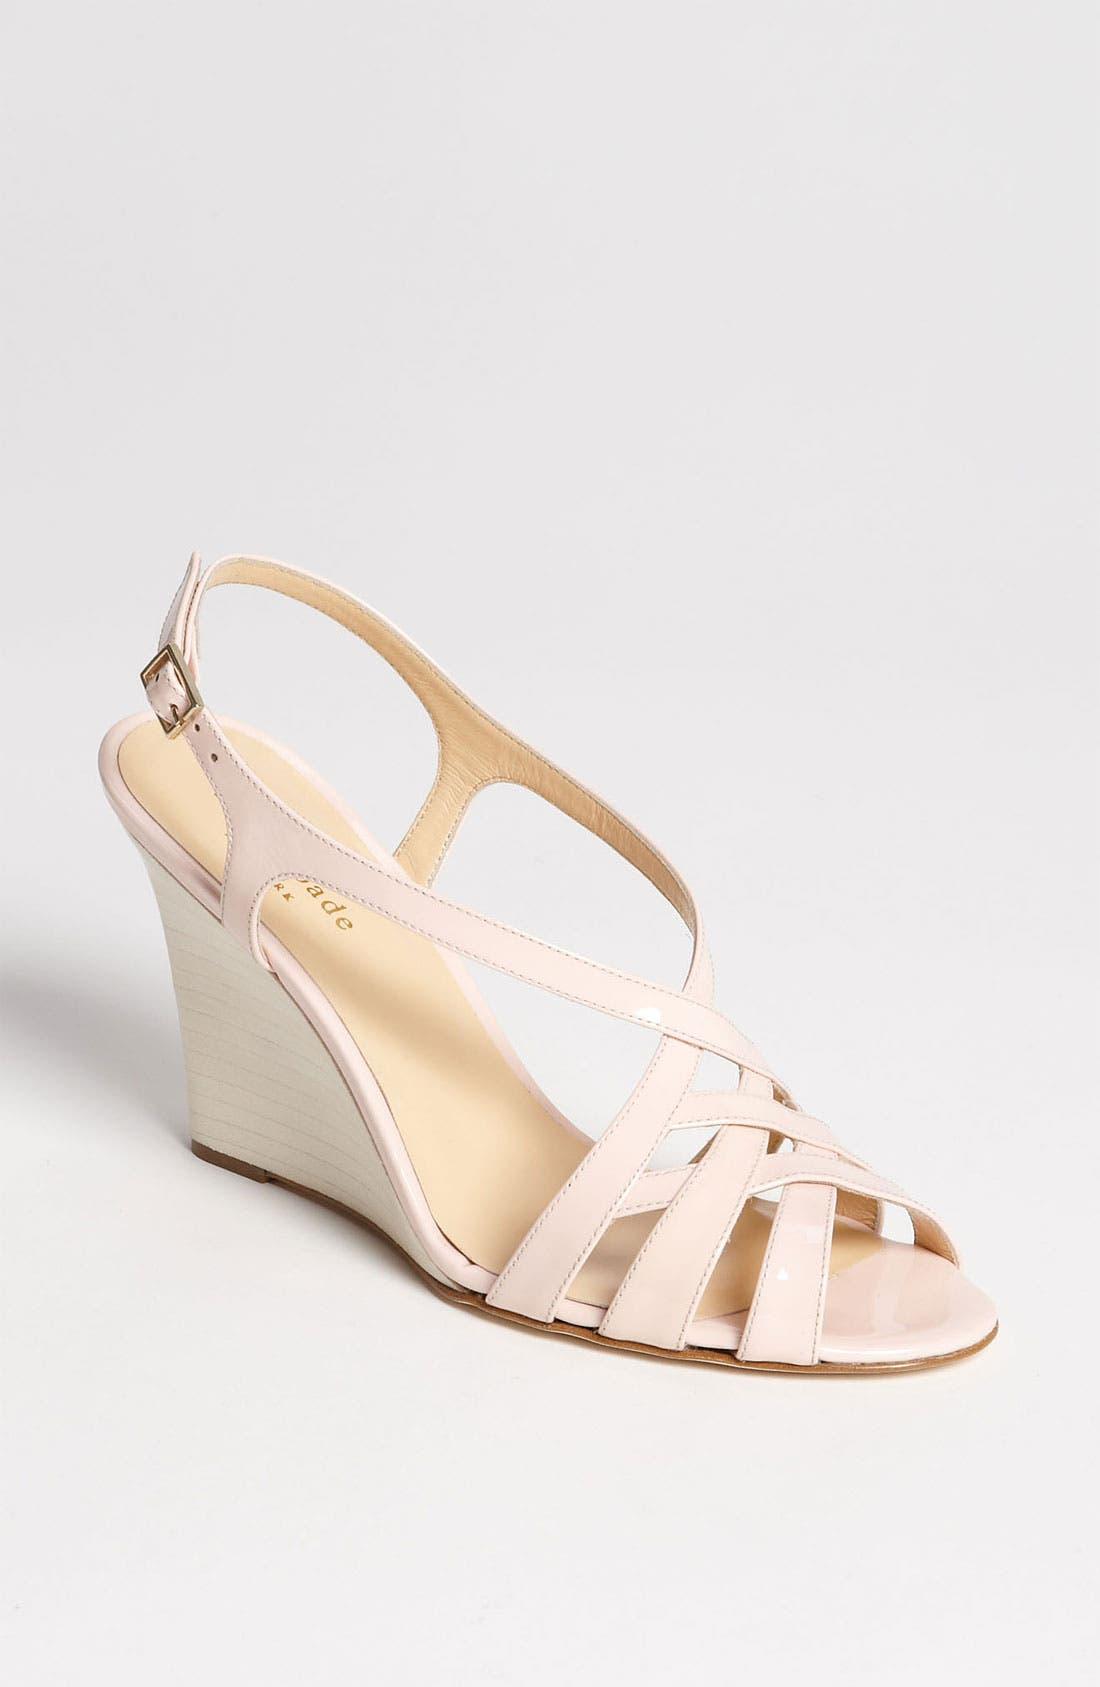 Alternate Image 1 Selected - kate spade new york 'illie' wedge sandal